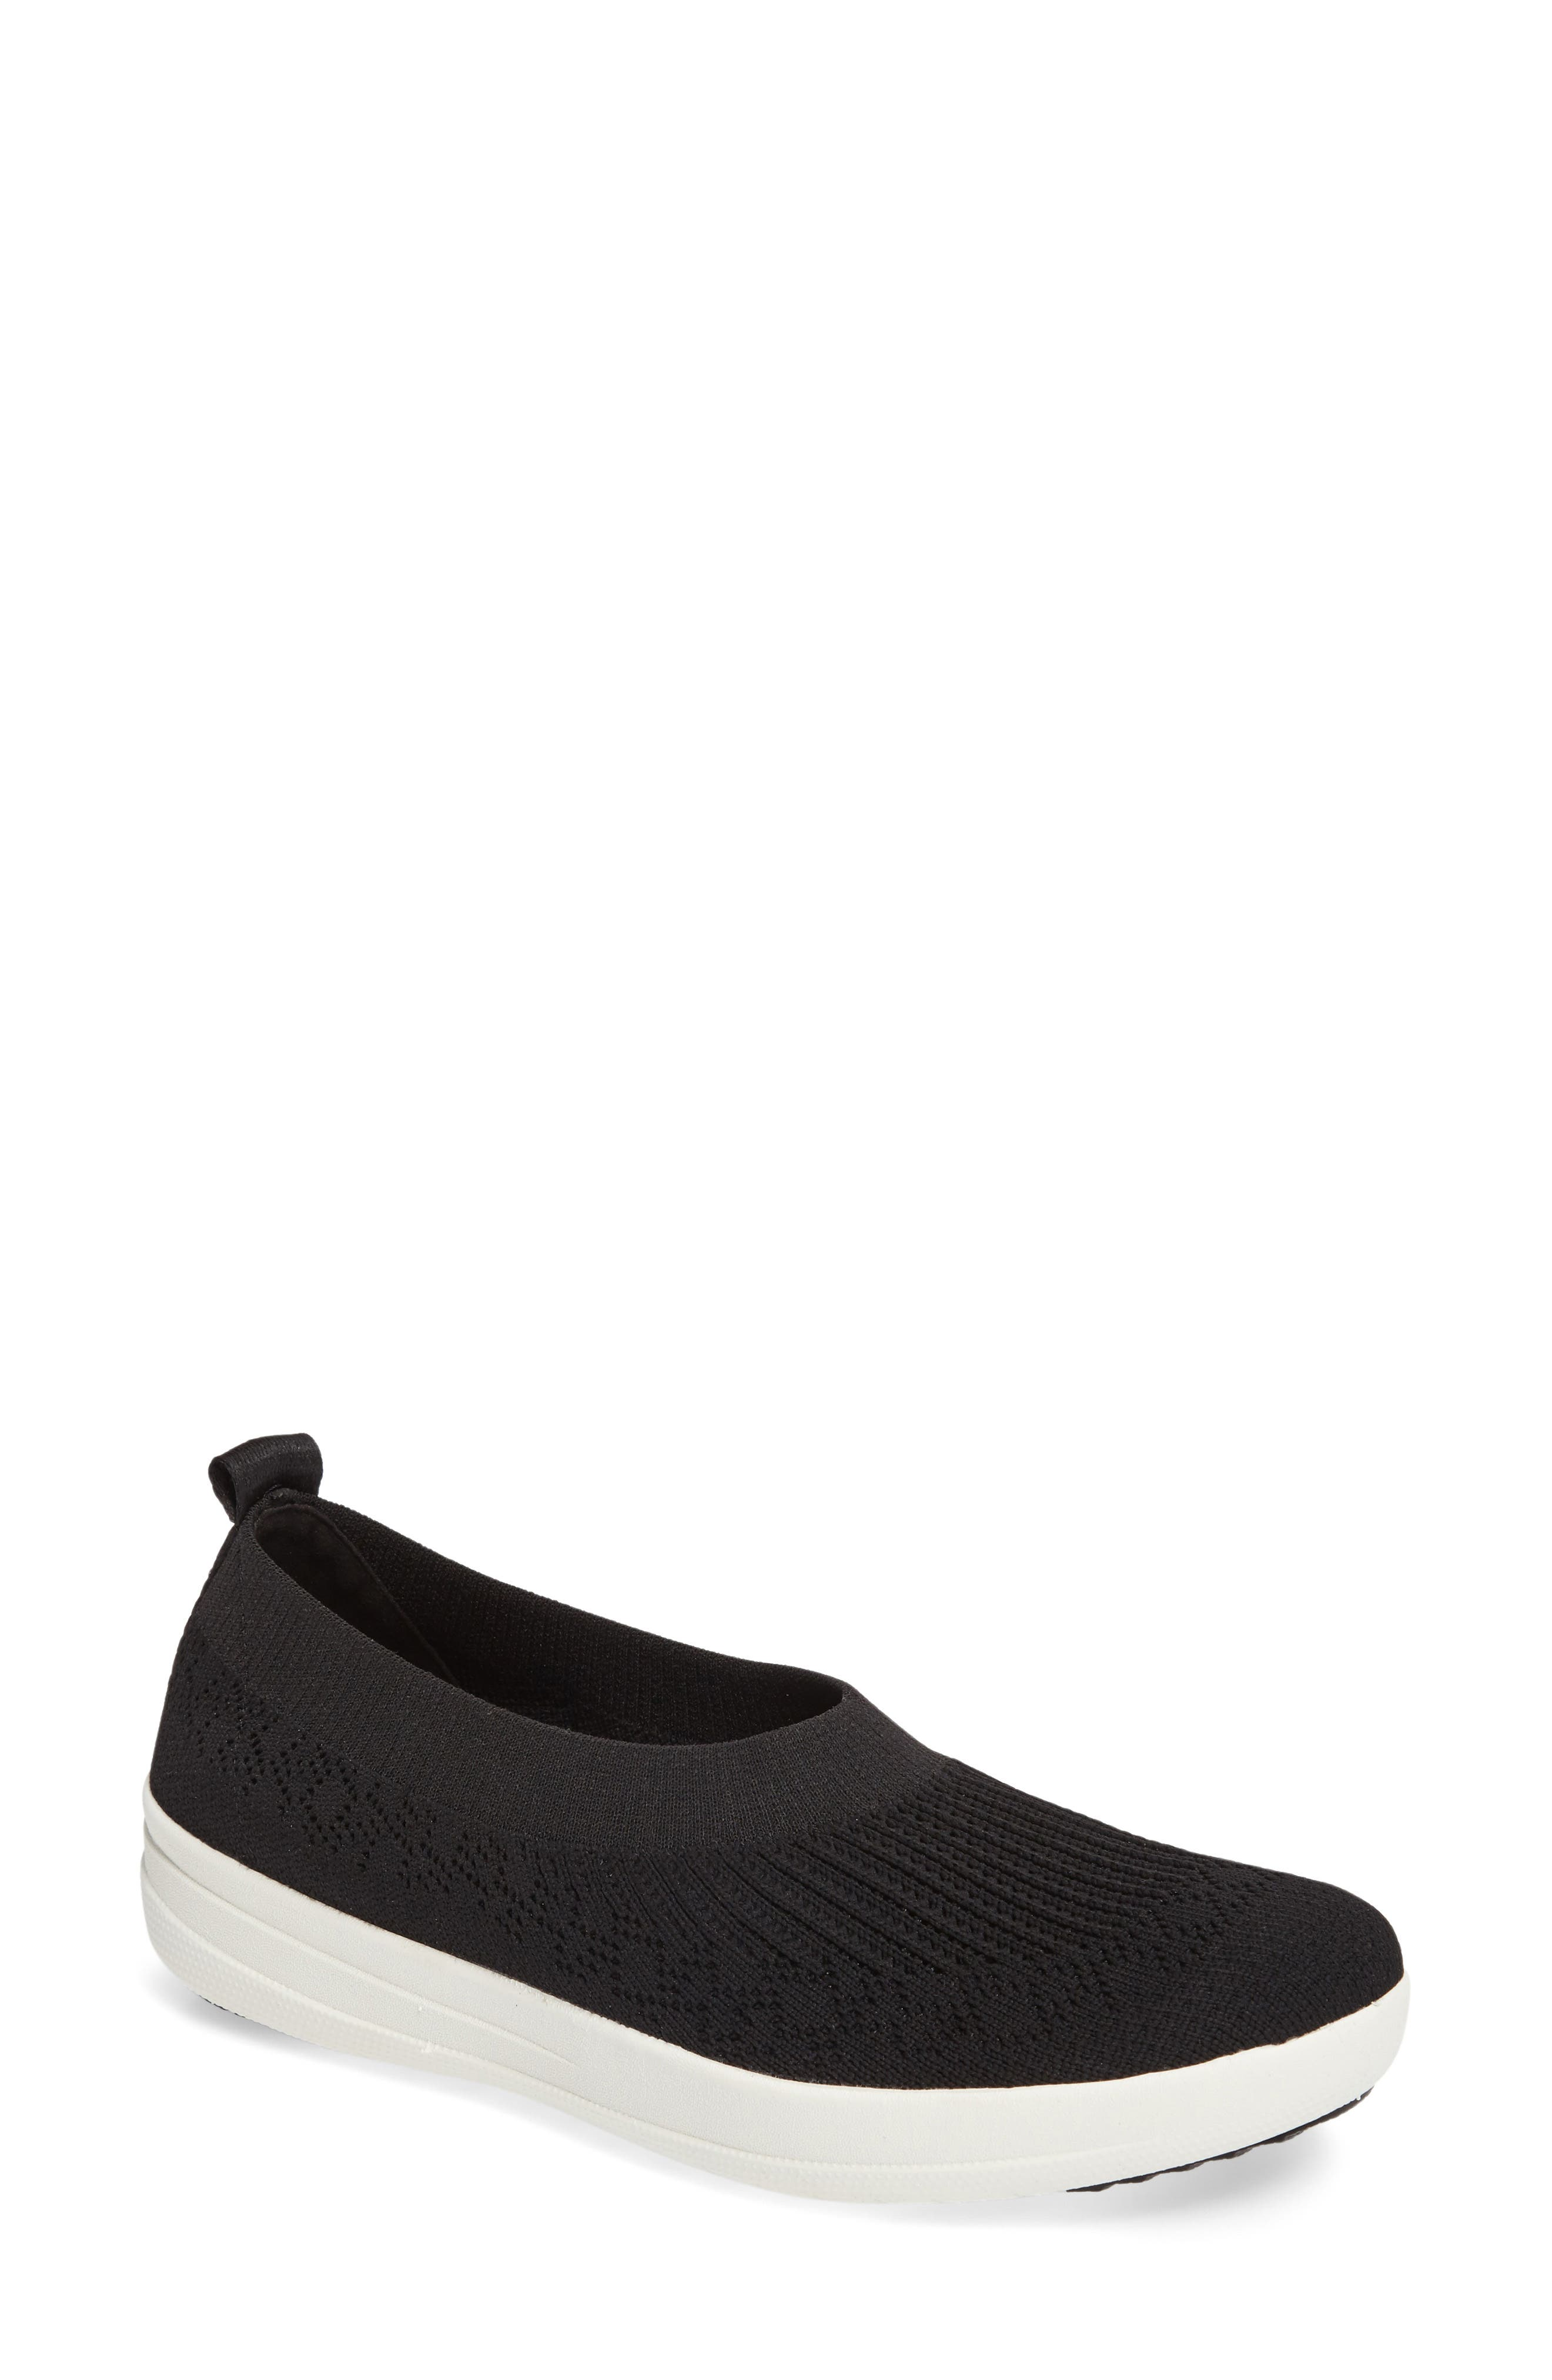 FITFLOP Uberknit Slip-On Sneaker, Main, color, BLACK FABRIC